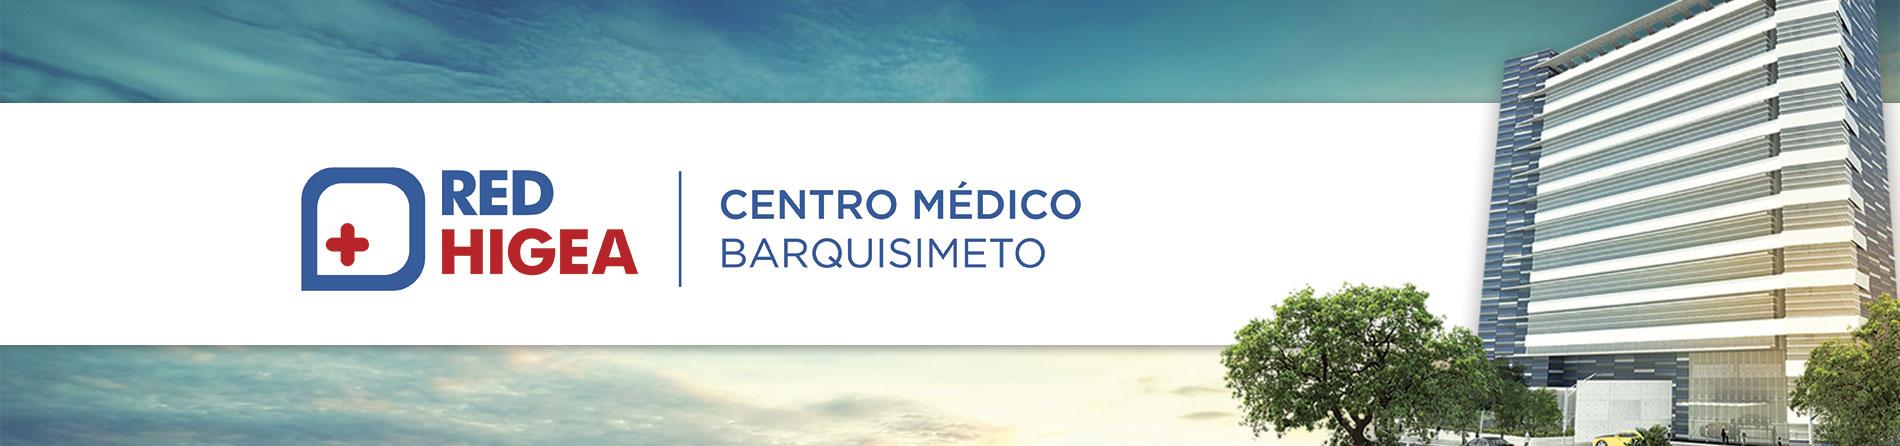 Centro Médico Barquisimeto